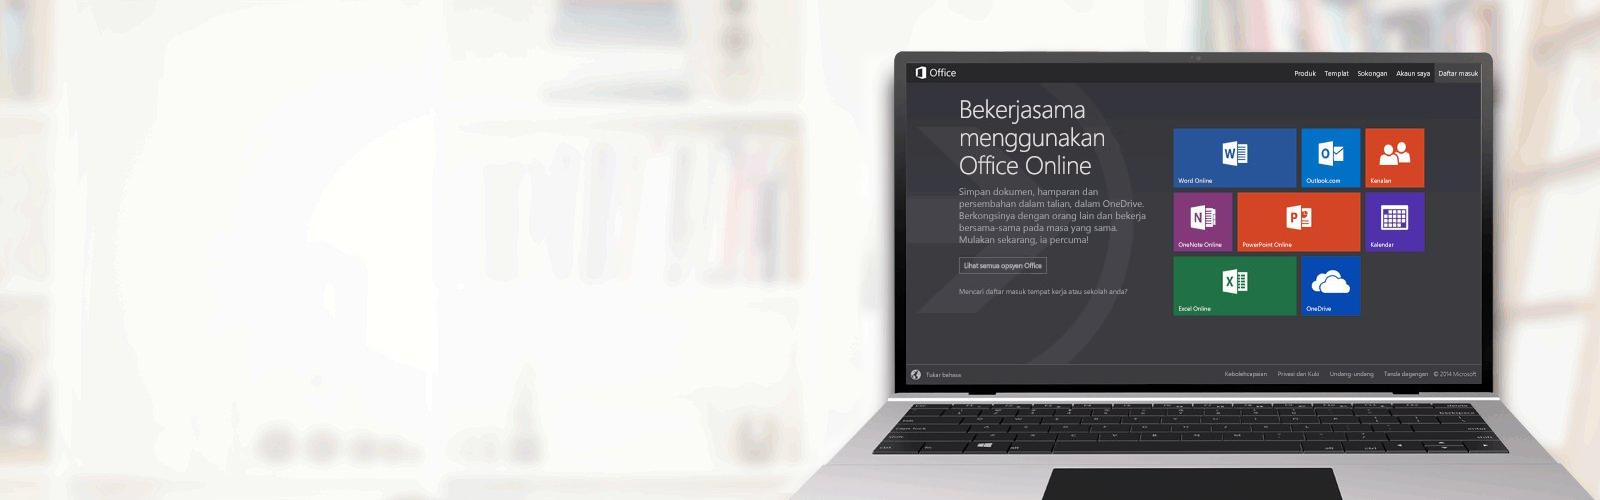 Bekerjasama menggunakan Office Online